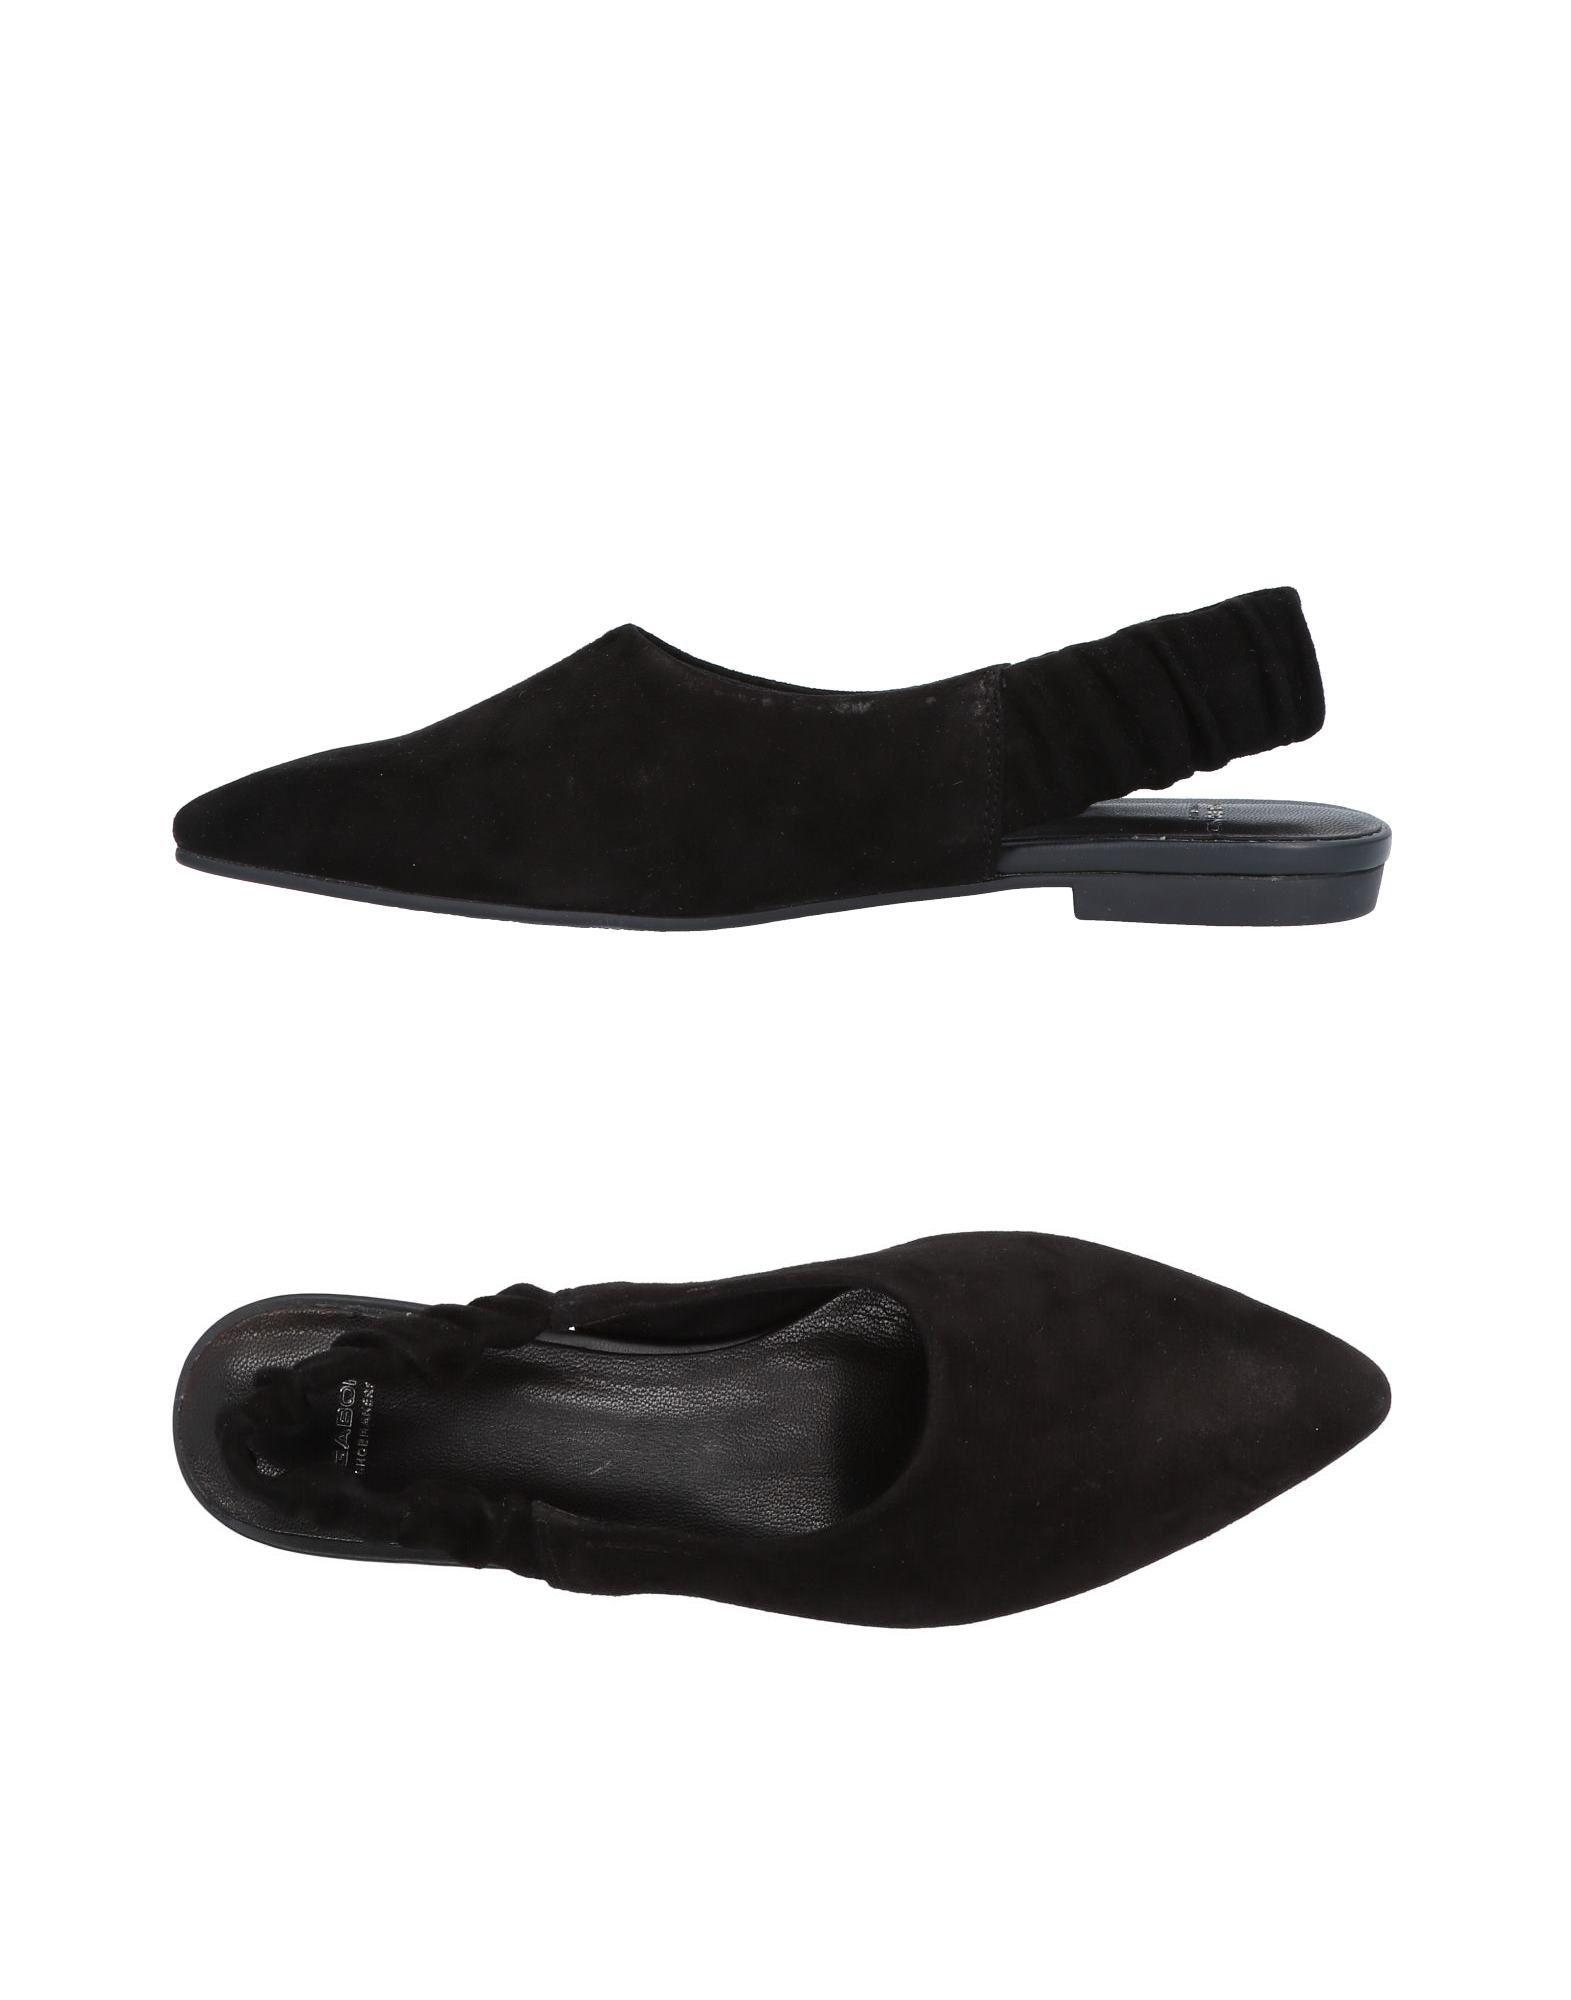 FOOTWEAR - Ballet flats on YOOX.COM Vagabond s3doU7Ah9l